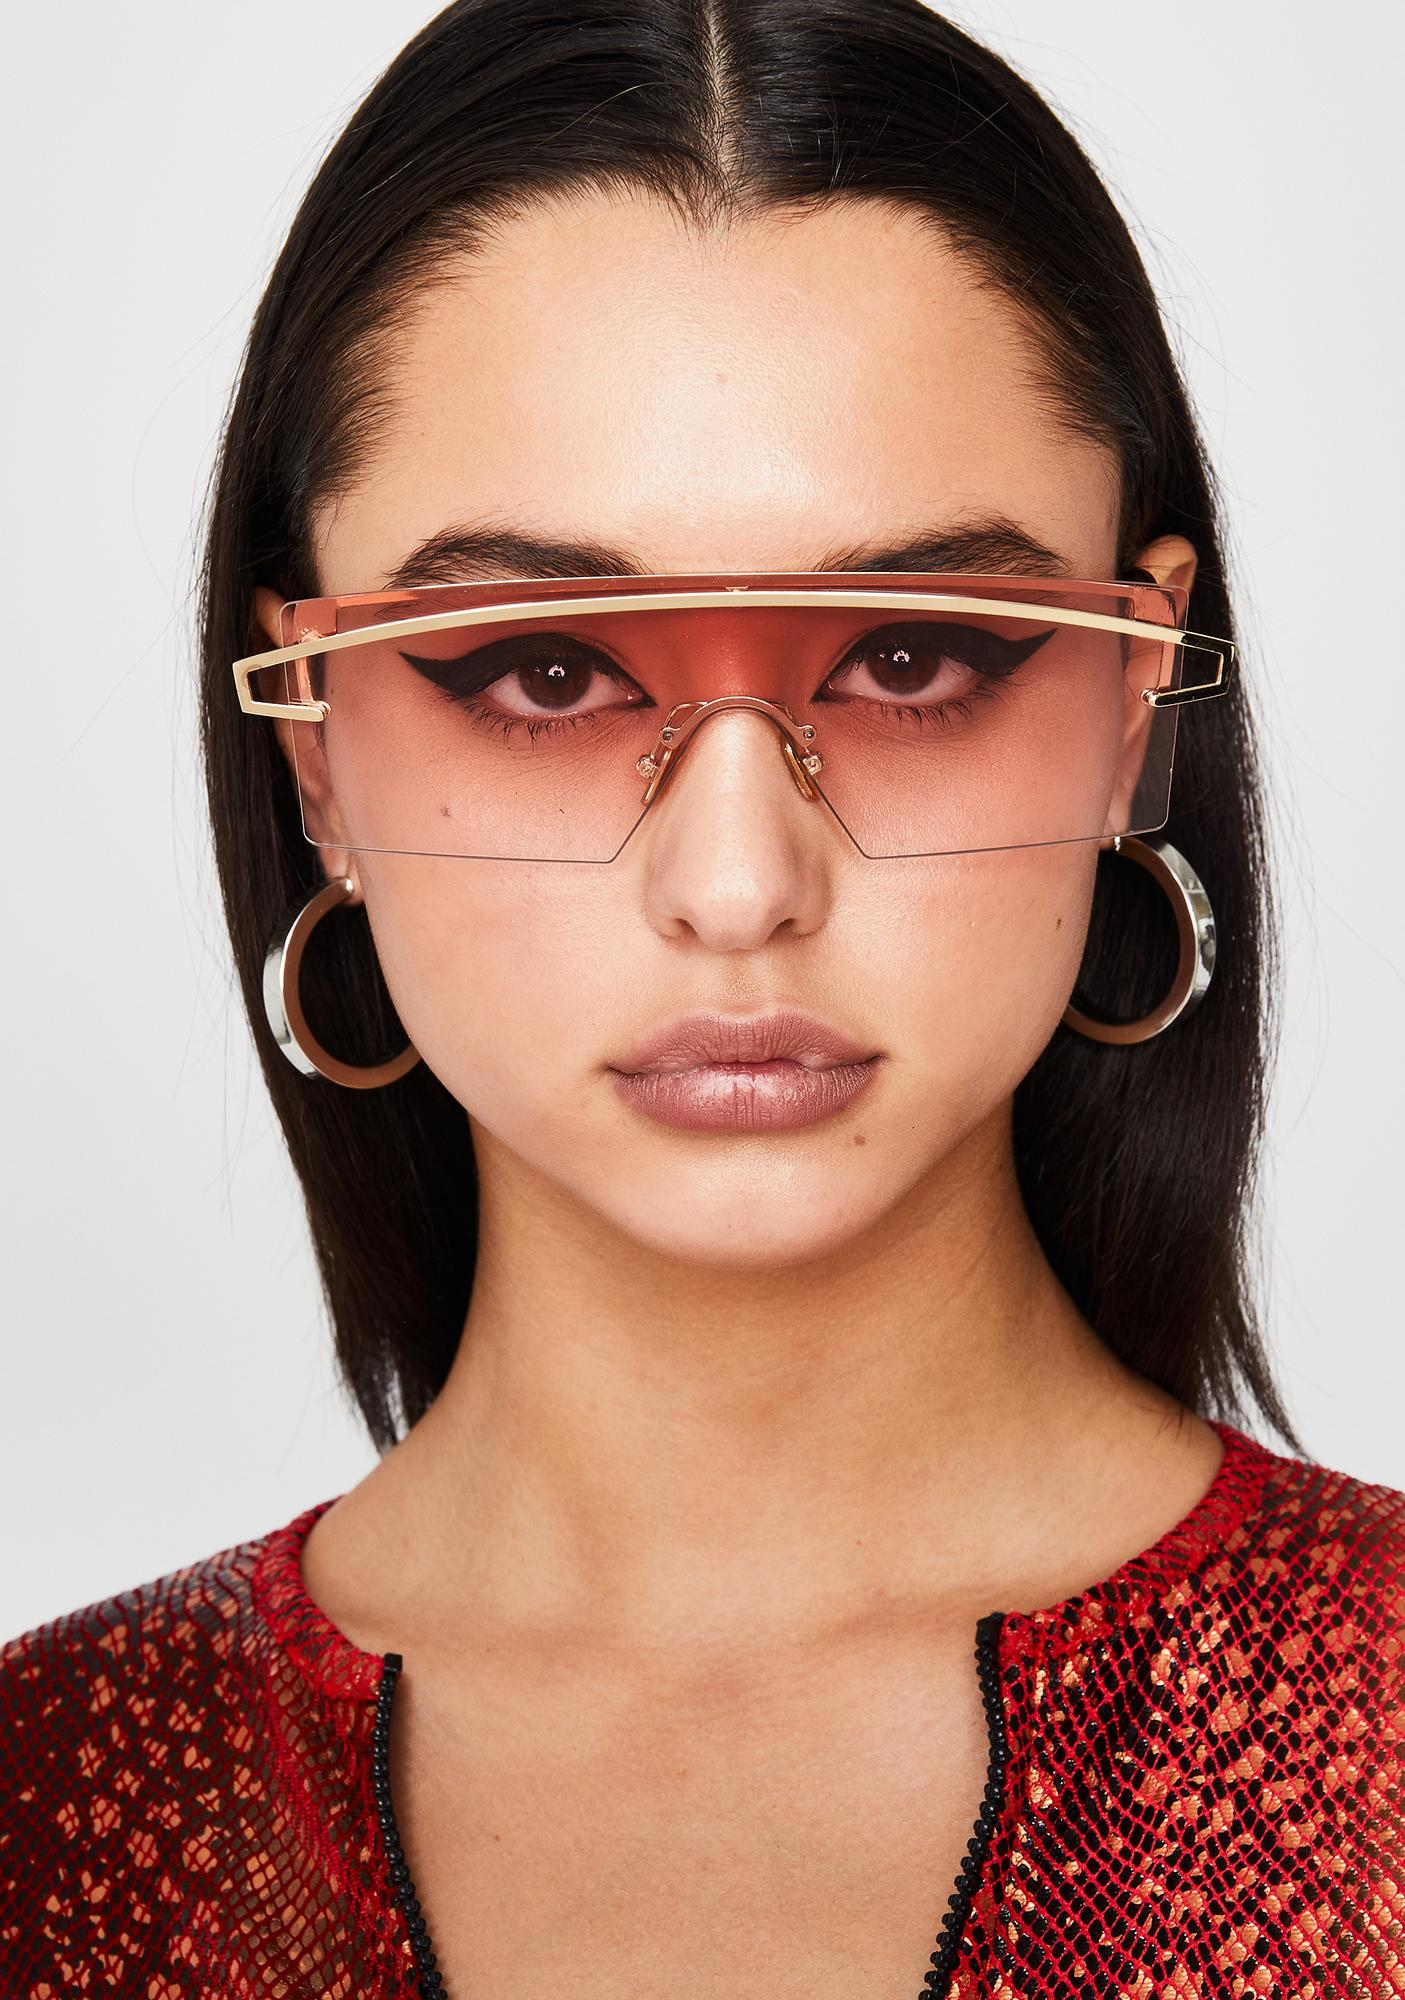 Candy Galactic Glow Shield Sunglasses